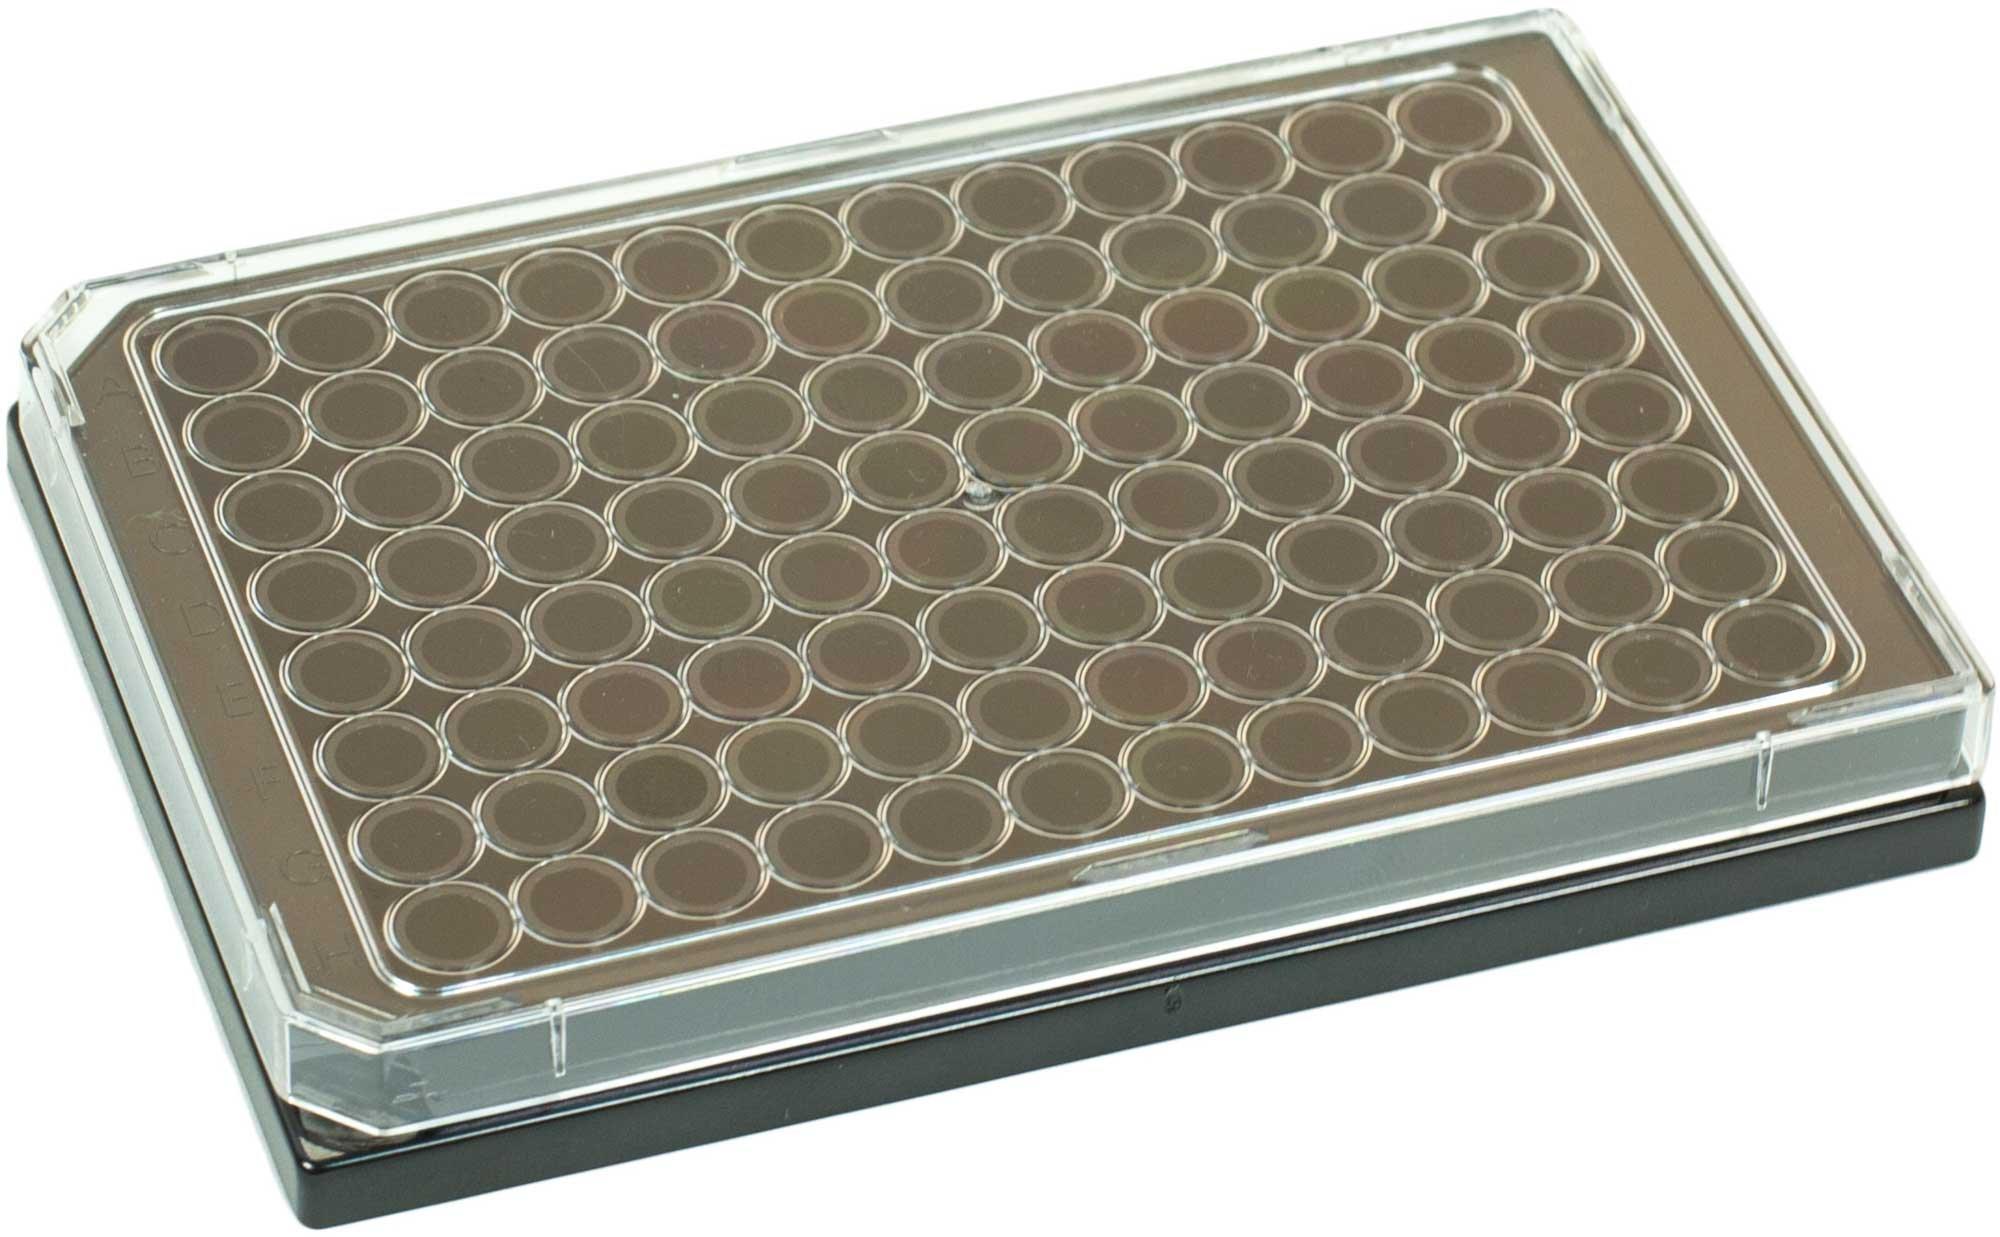 BRANDplates cellGrade Premium Treated Sterile Surface 96-Well Plate - Black, Transparent F-Bottom